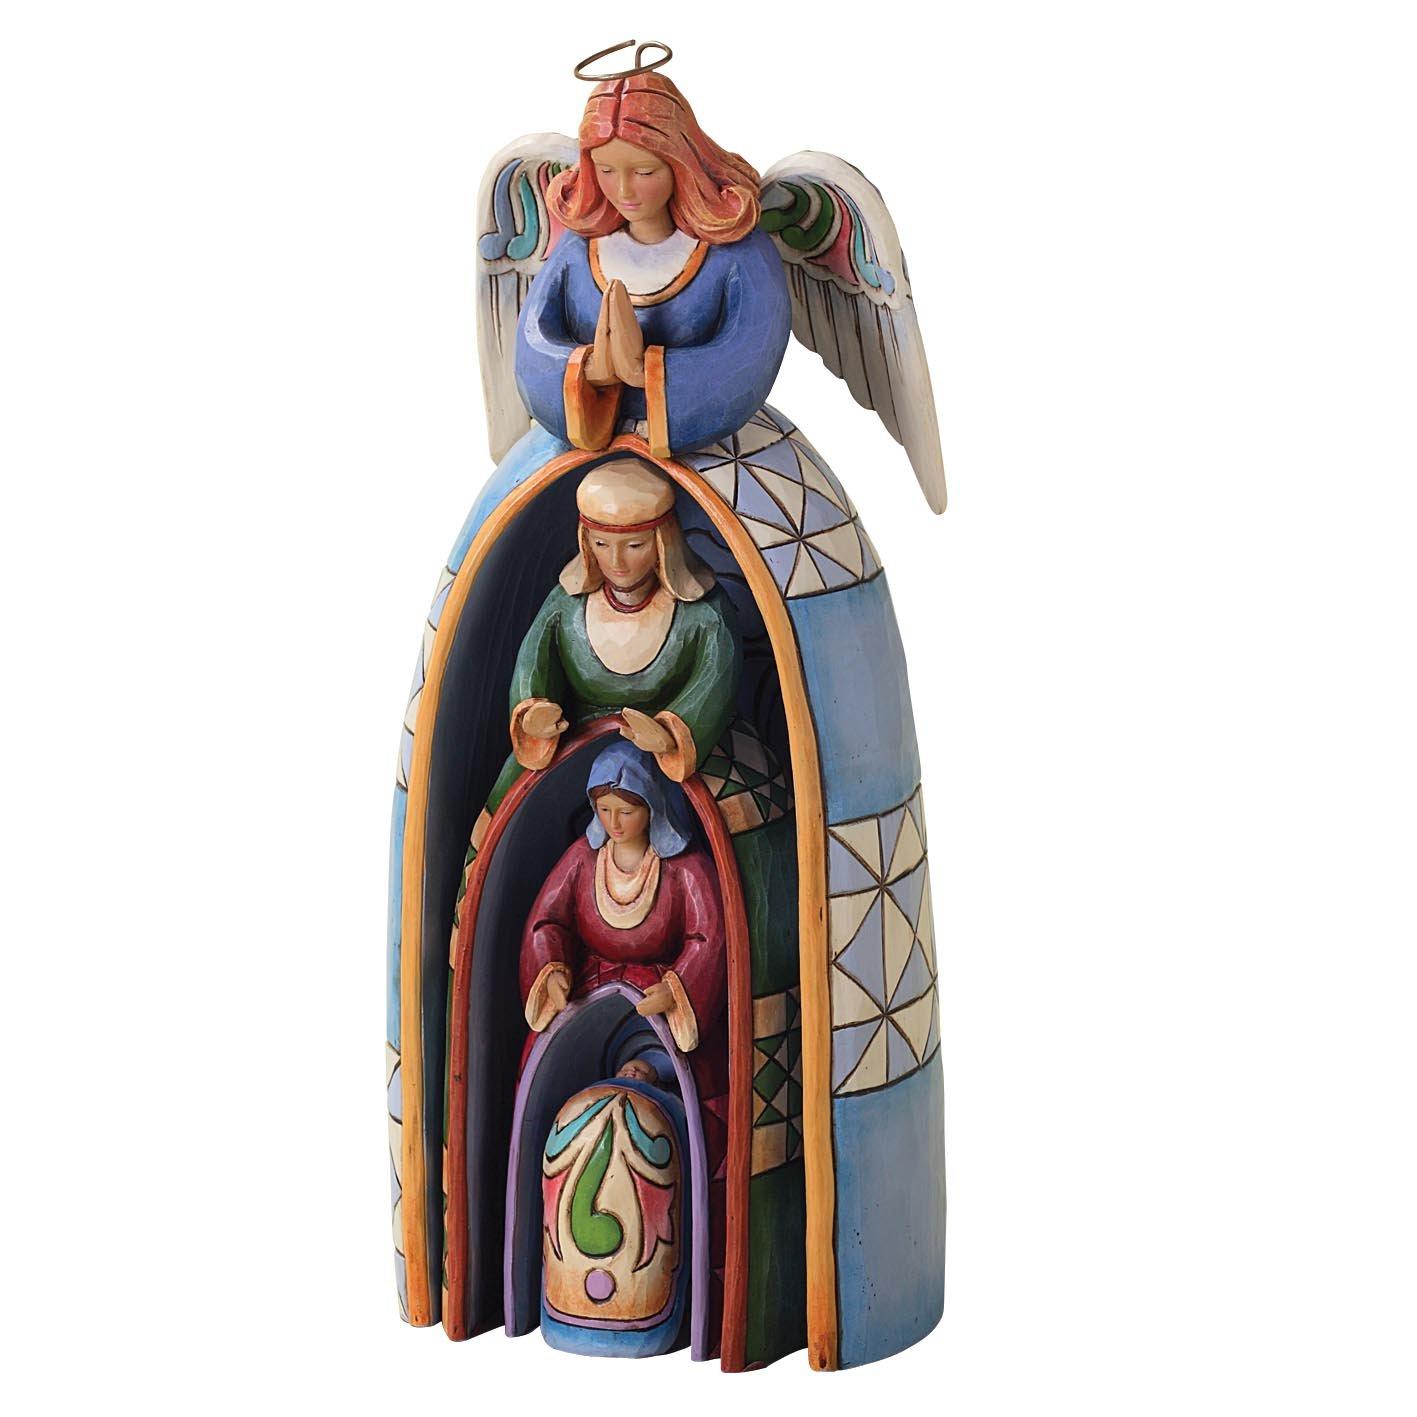 Enesco Jim Shore Heartwood Creek Nestled Holy Family Nativity 4-Piece Set, 9-3/4-Inch